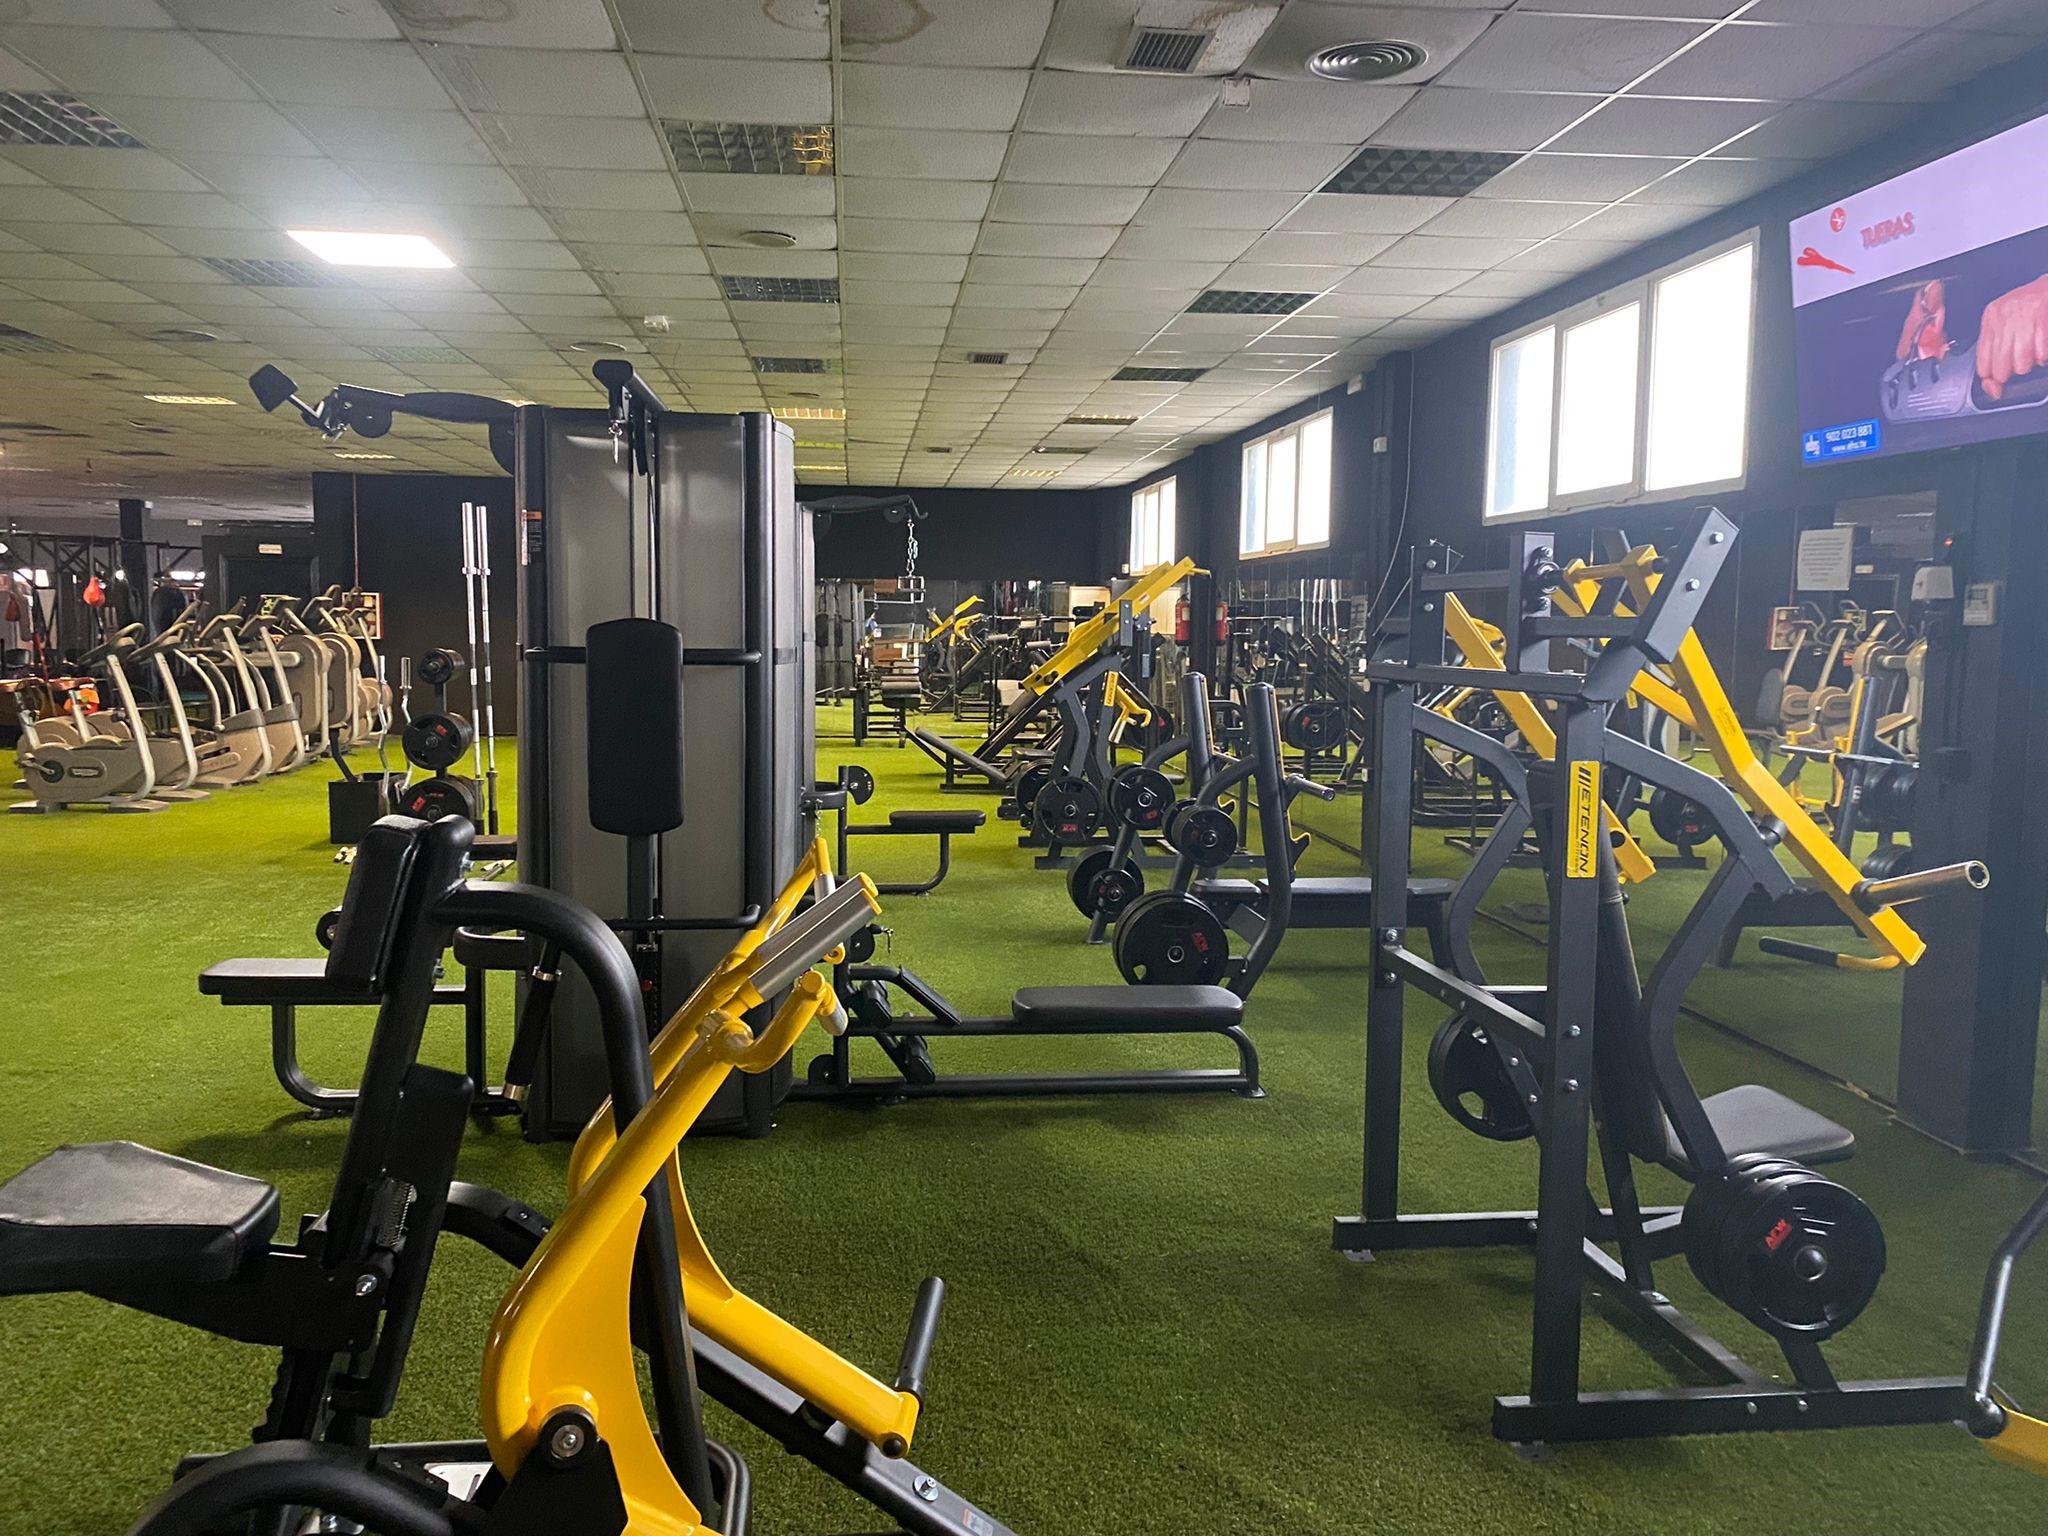 Los gimnasios Emporio Barceló y Live´s Fitness se equipan con Oss Fitness